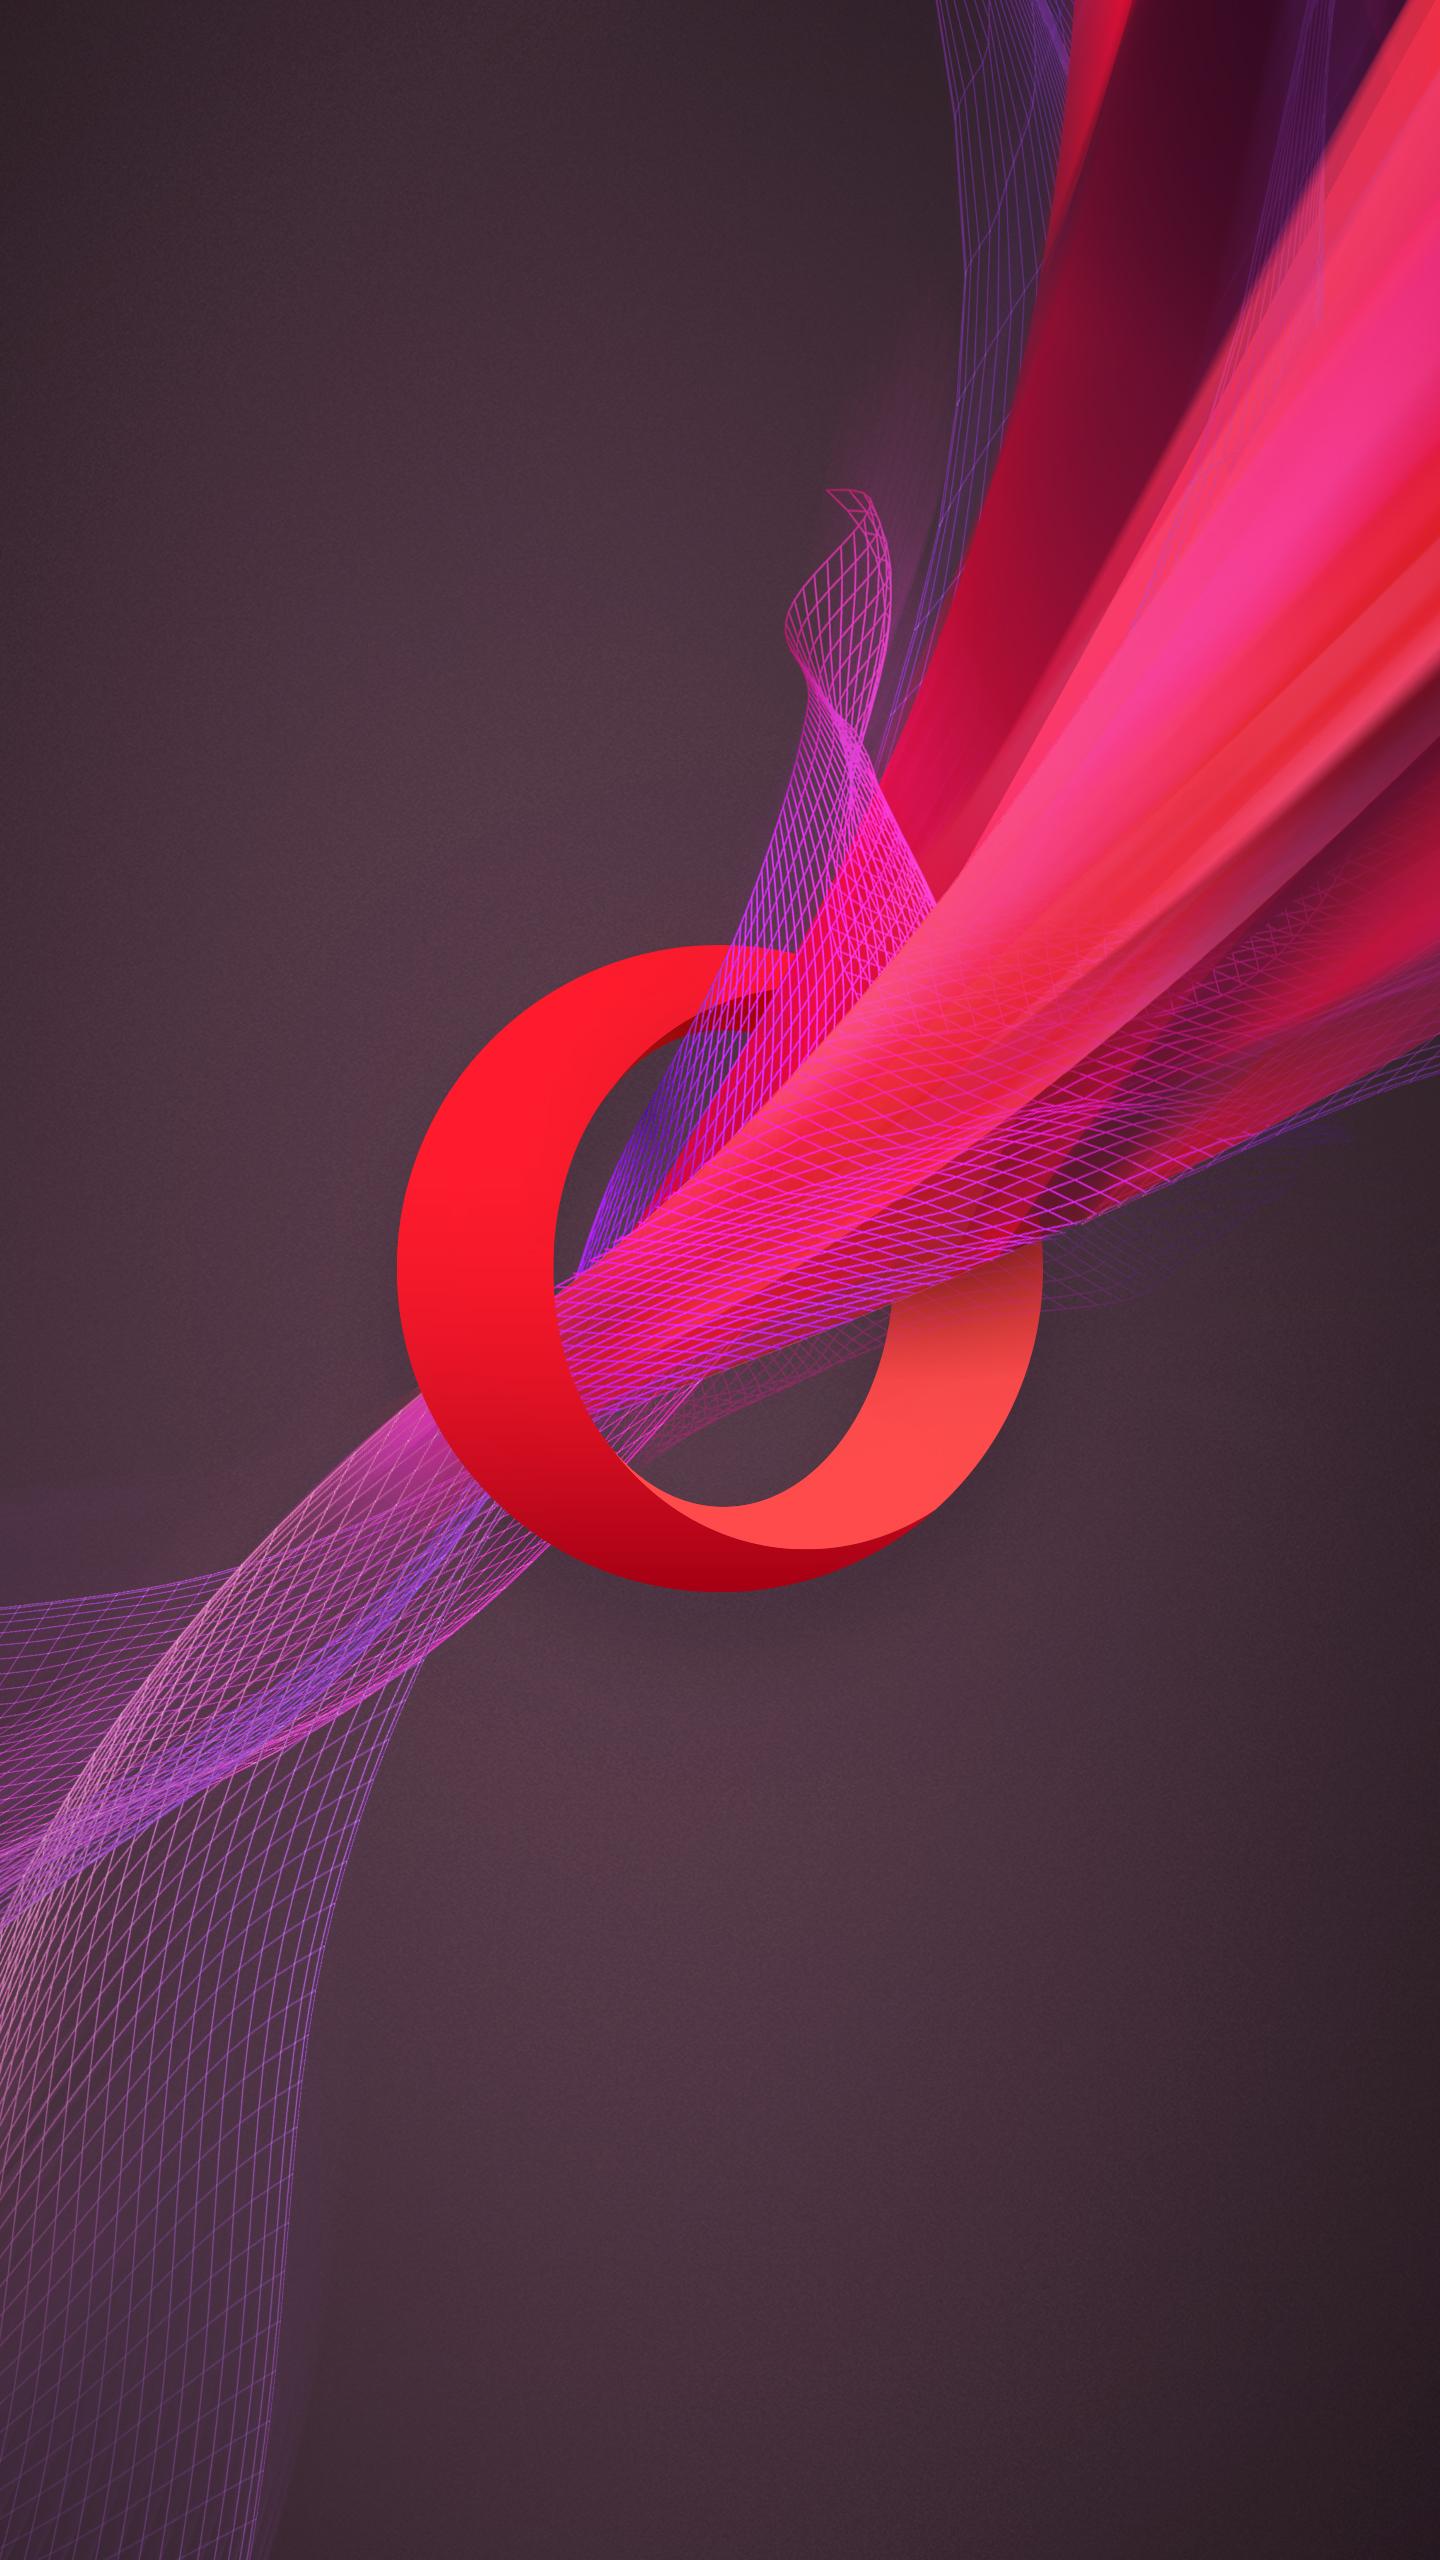 Opera Browser Wallpaper